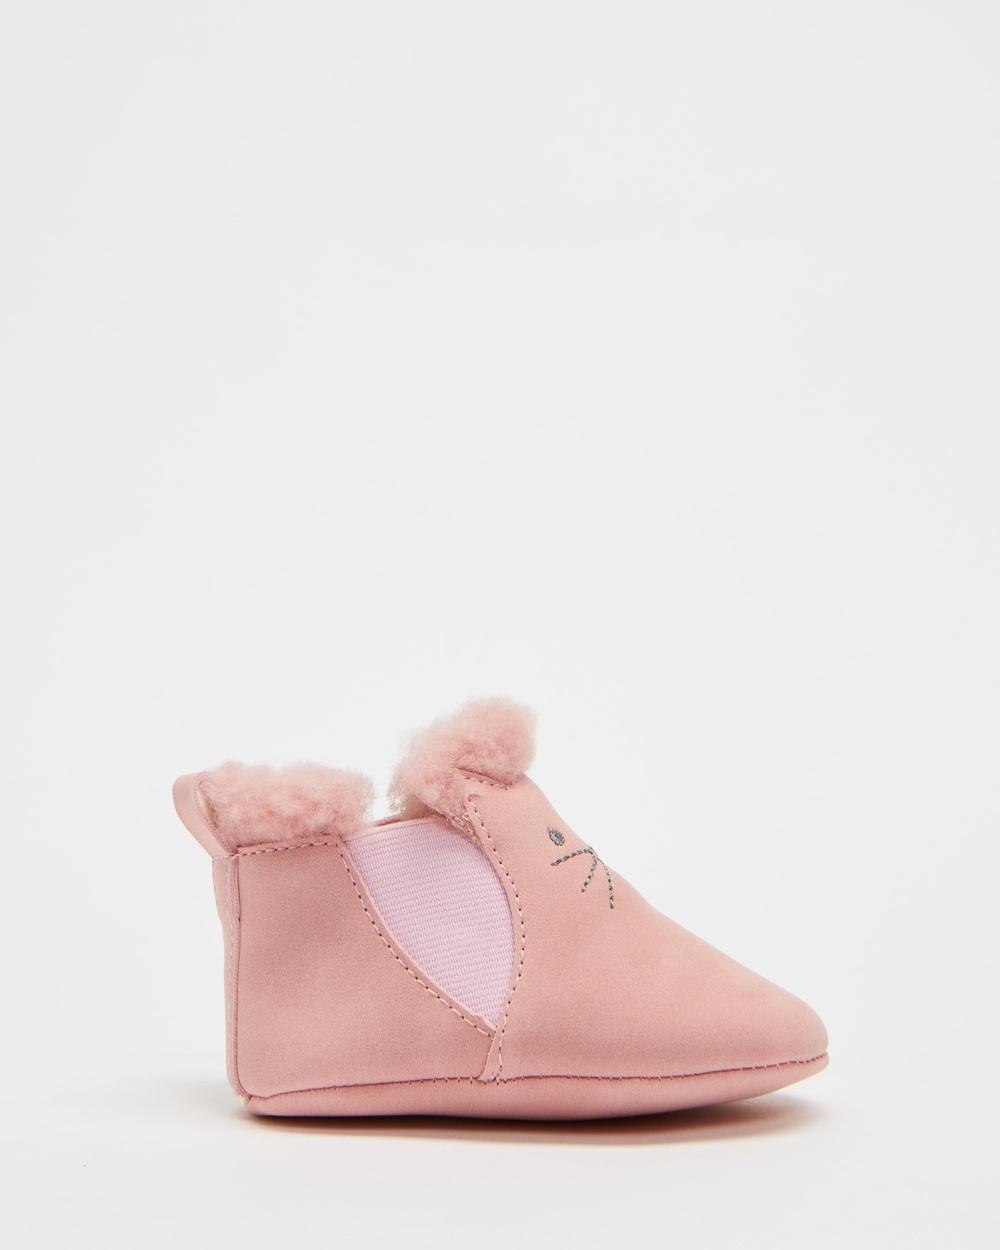 Walnut Melbourne Tulip Booties Babies Boots Pale Pink